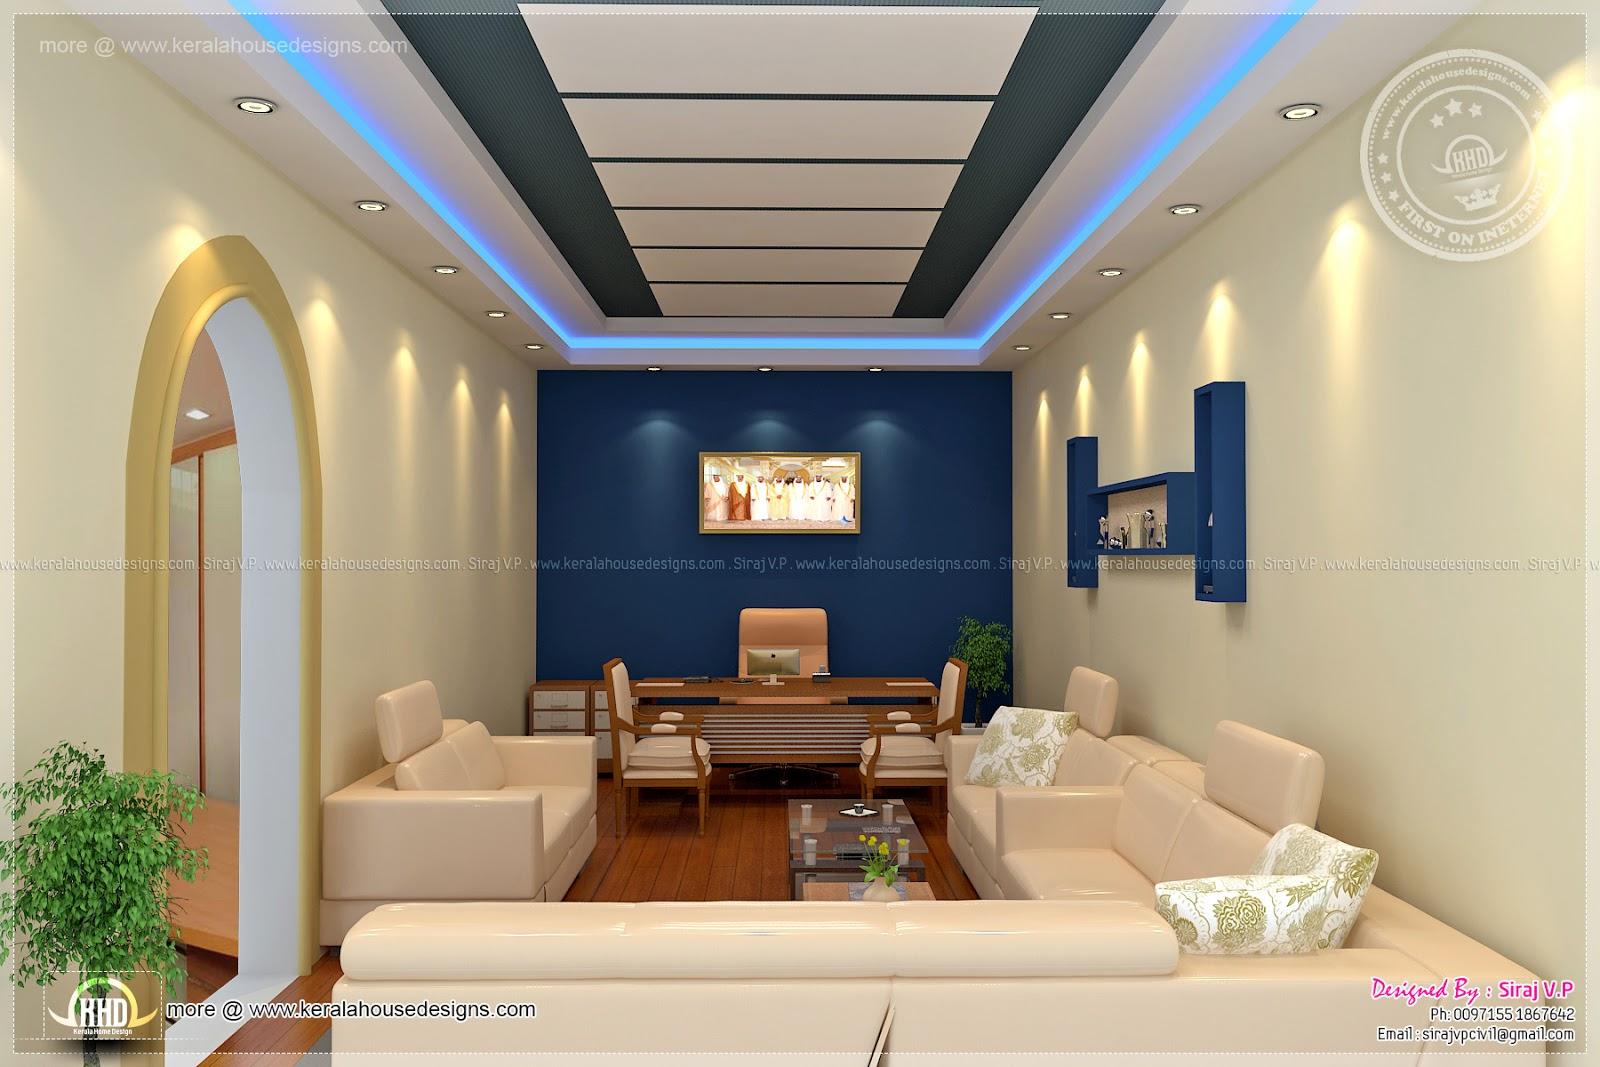 Home office interior design by siraj v p kerala home - Home office interior design pictures ...